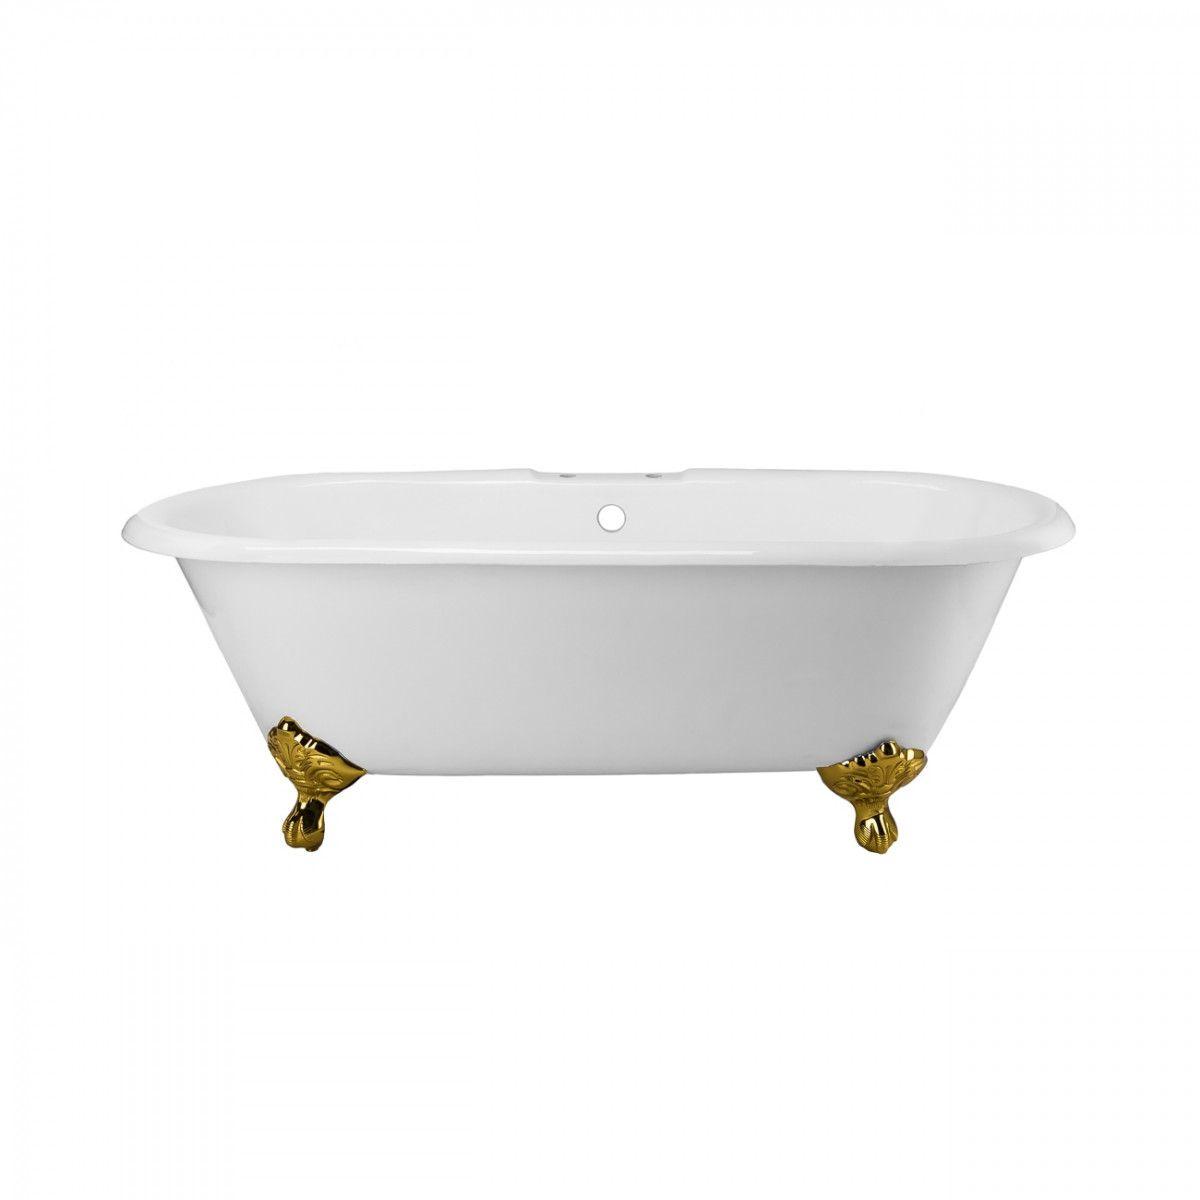 Cambridge Cast Iron Double Ended Clawfoot Tub Rim Faucet Drillings Soaking Bathtubs Bathtub Clawfoot Tub